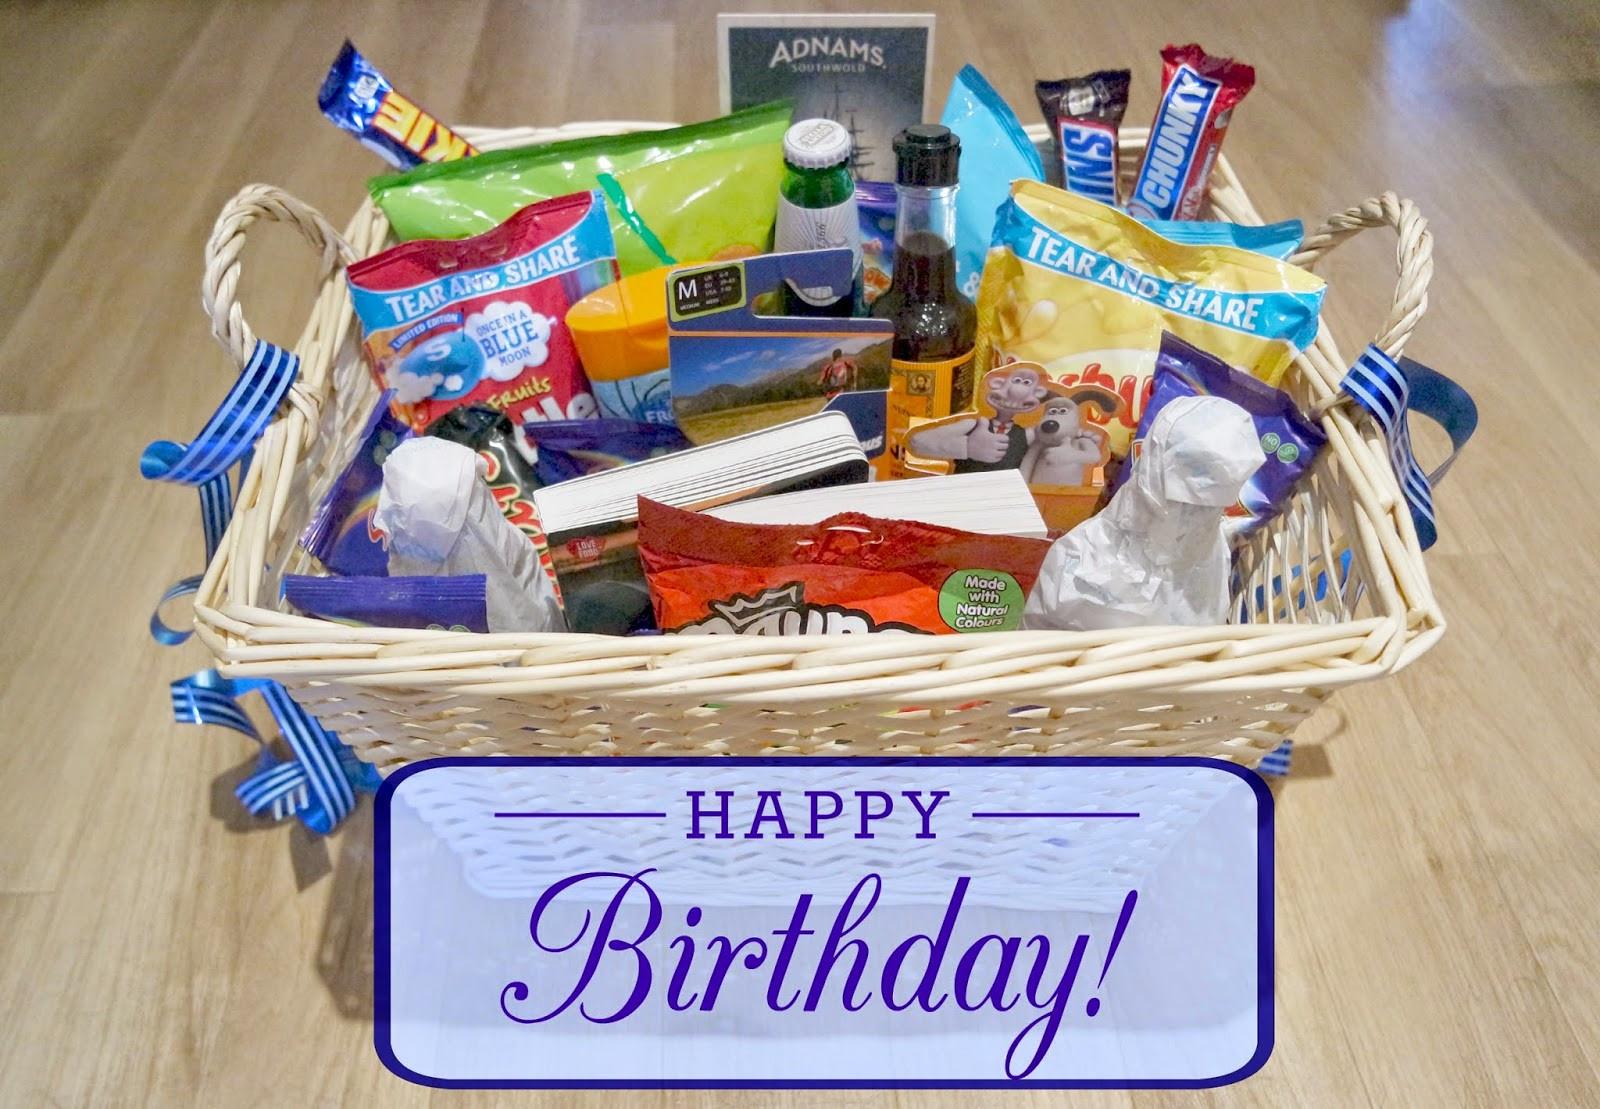 Male Birthday Gift Ideas  Uptown Peach My Dad s 50th Birthday Hamper